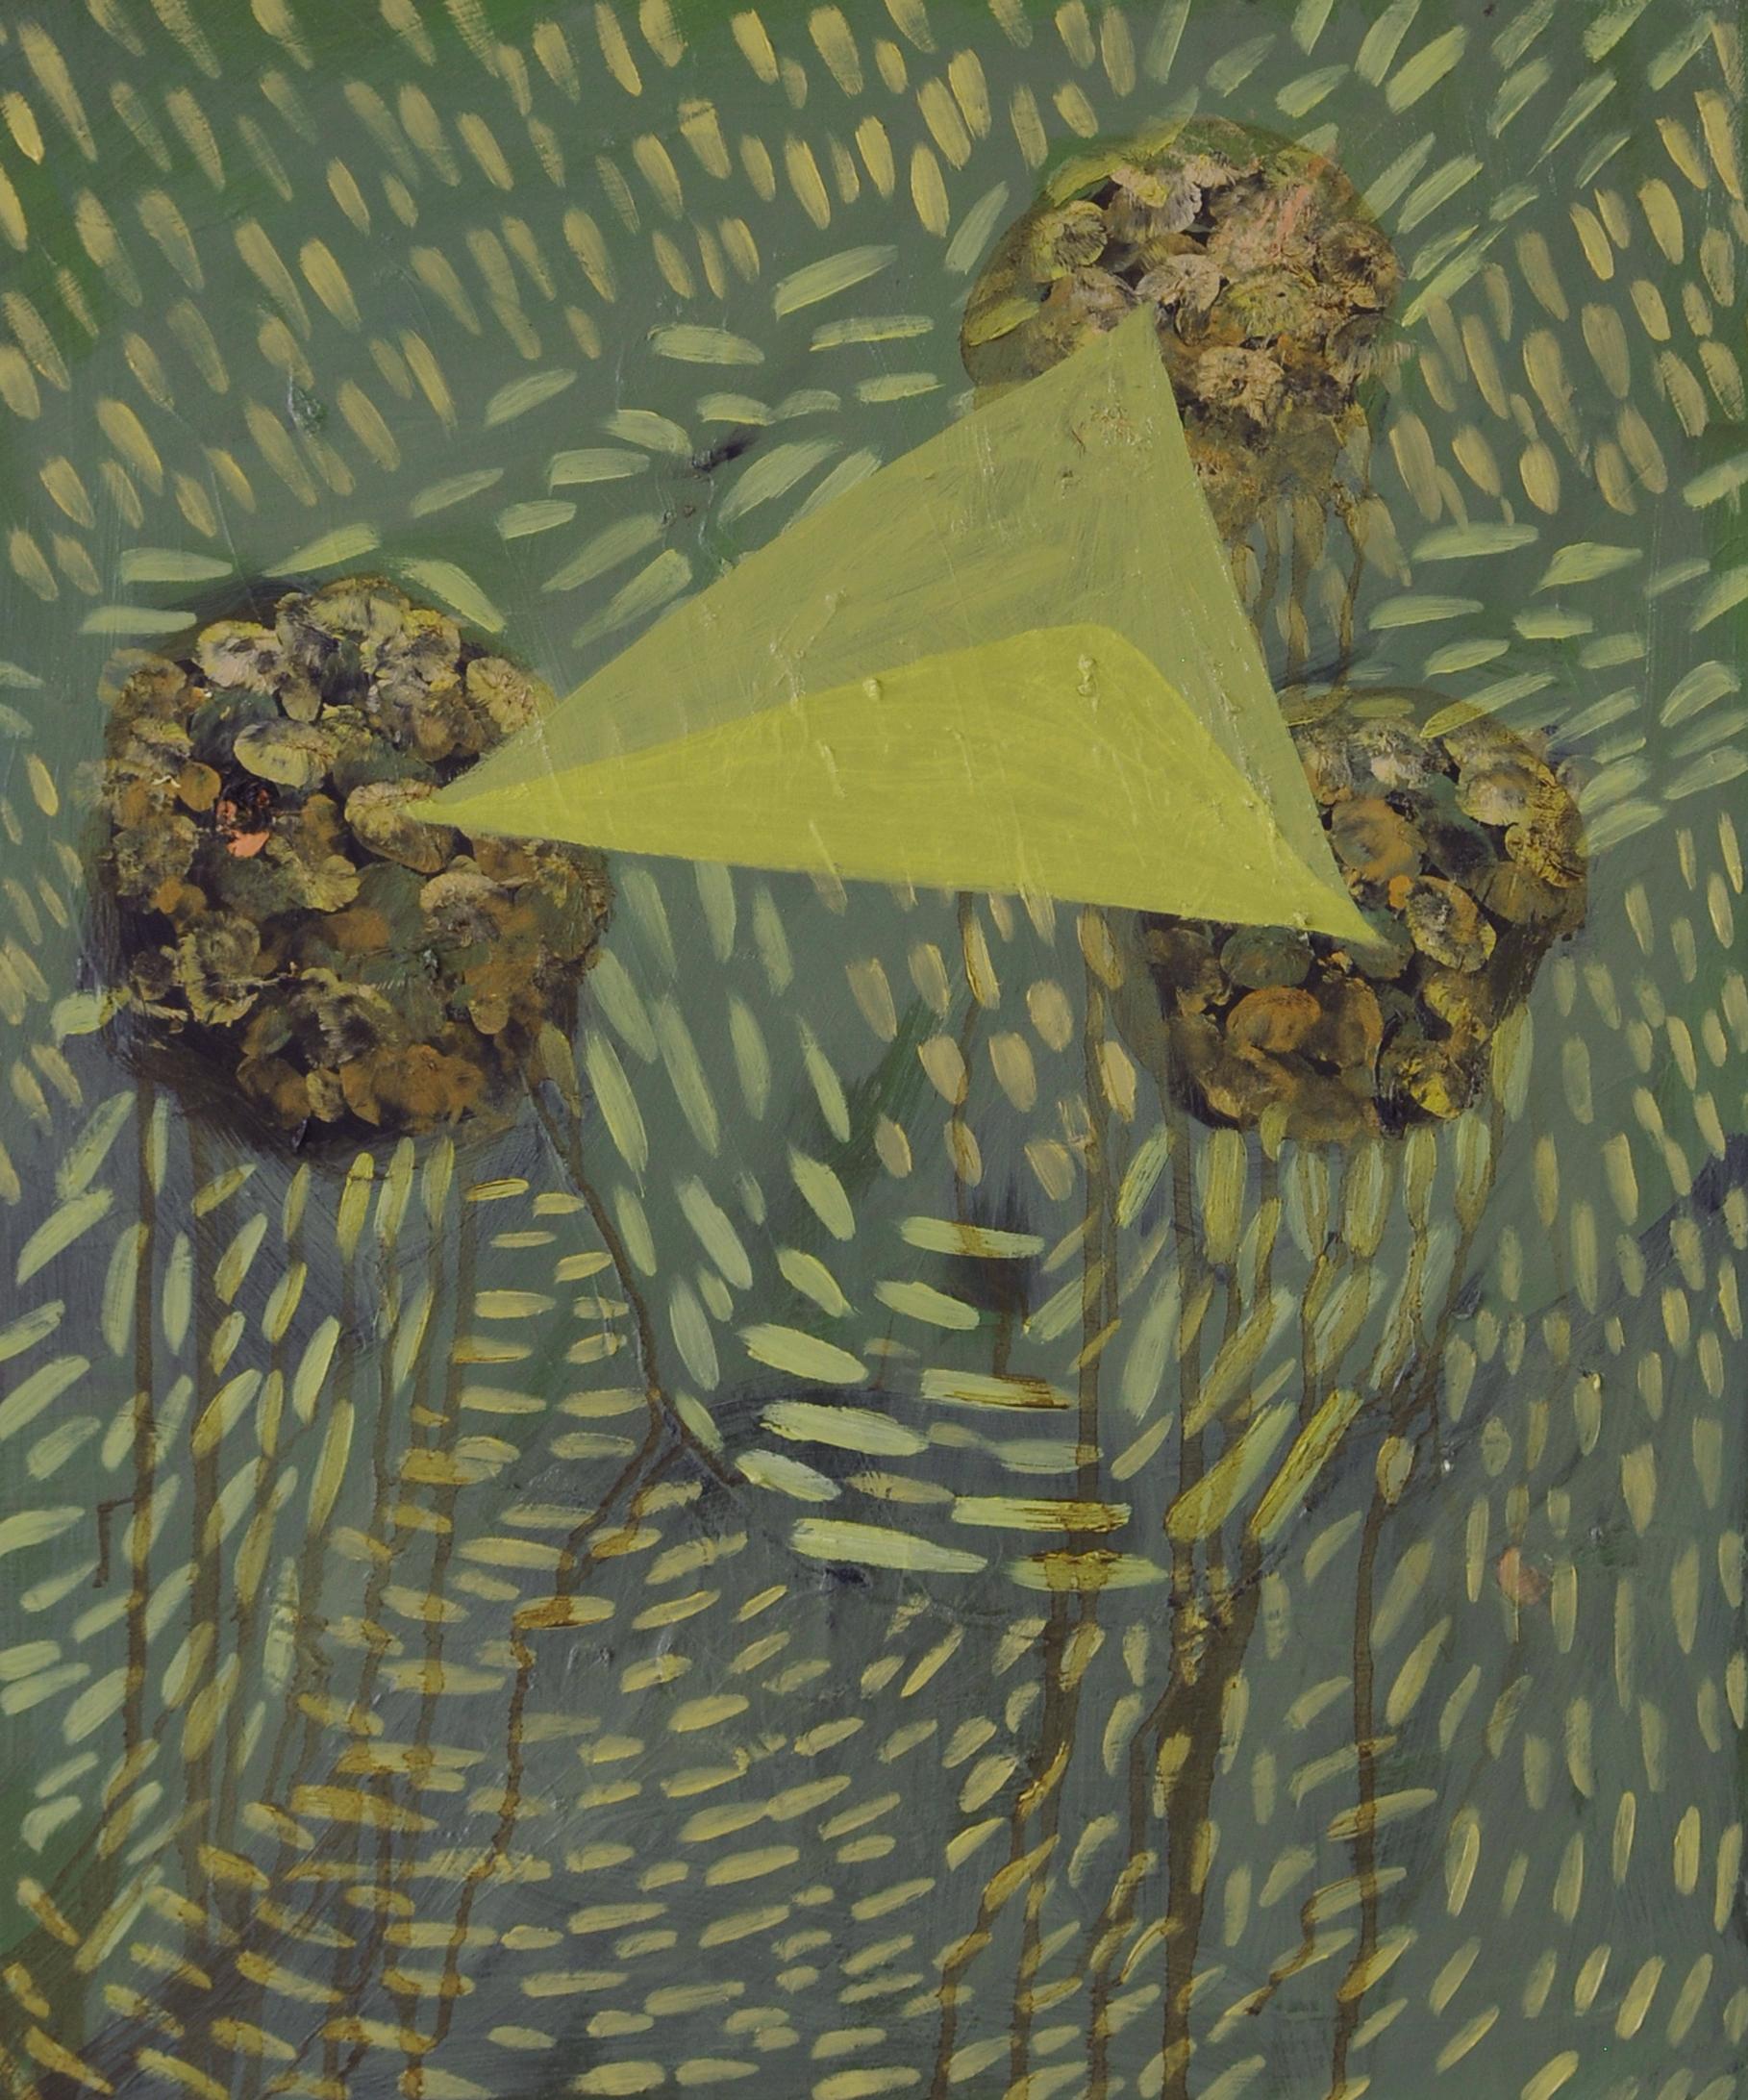 Envelope, 2011, Oil on cotton, 60 x 50 cm